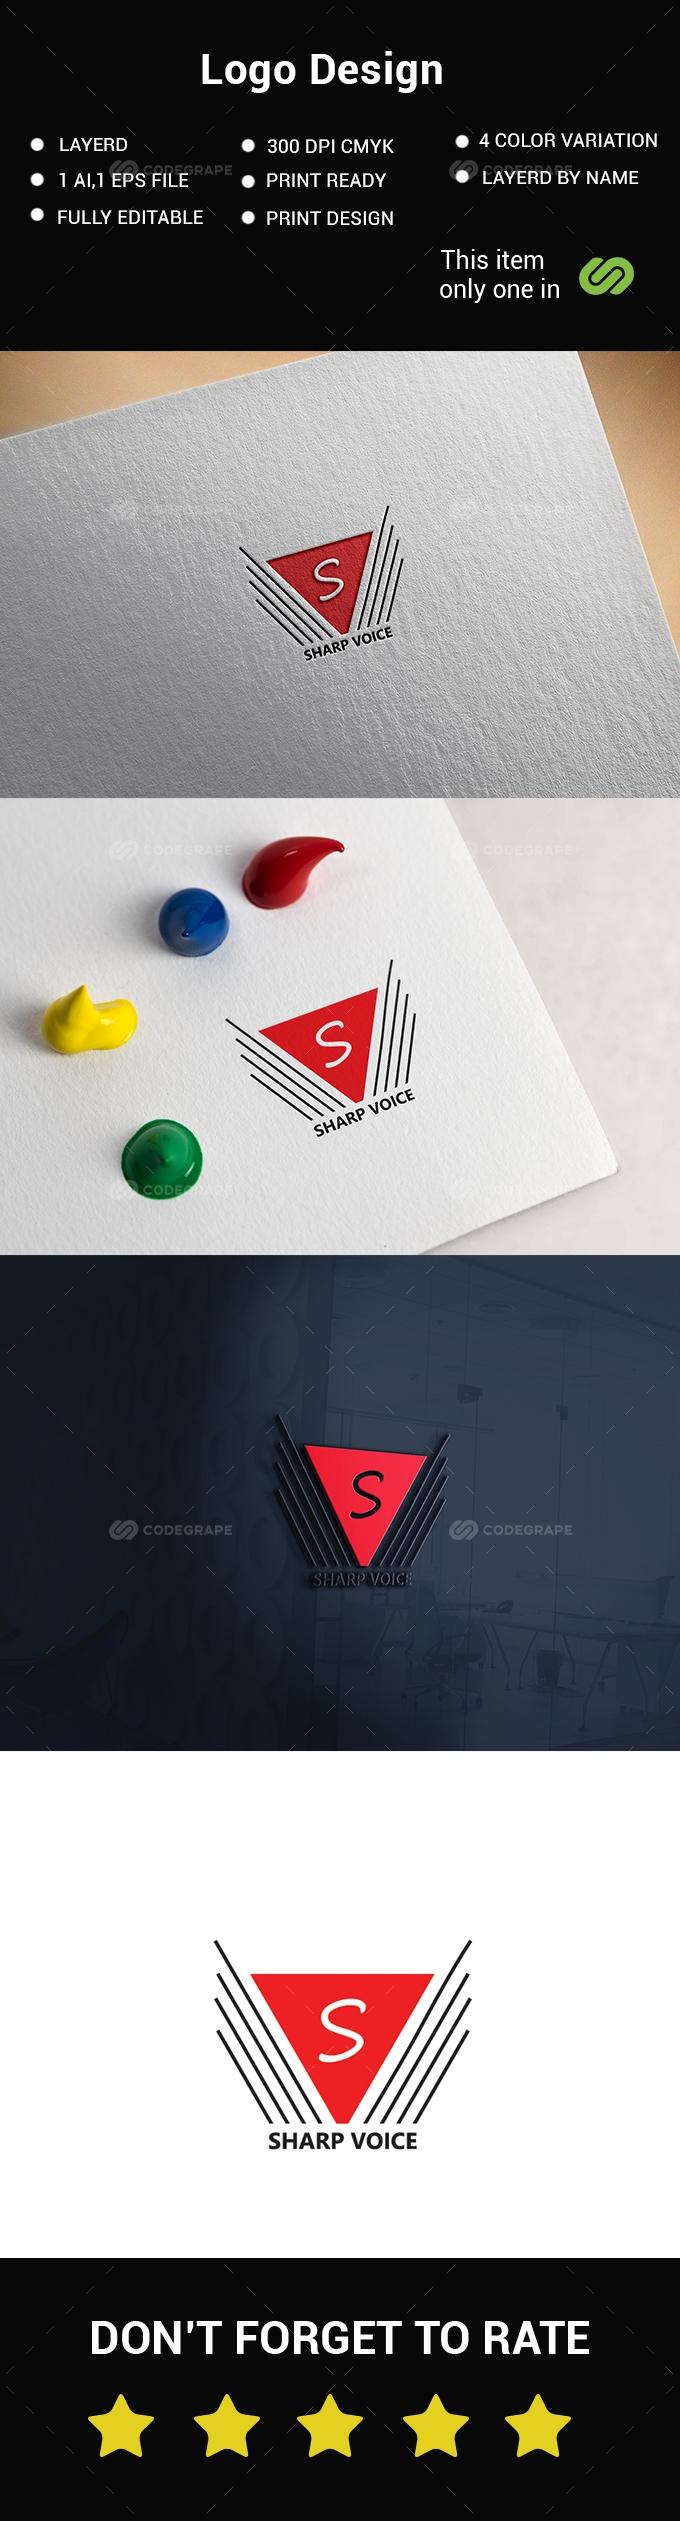 Voice Logo Design